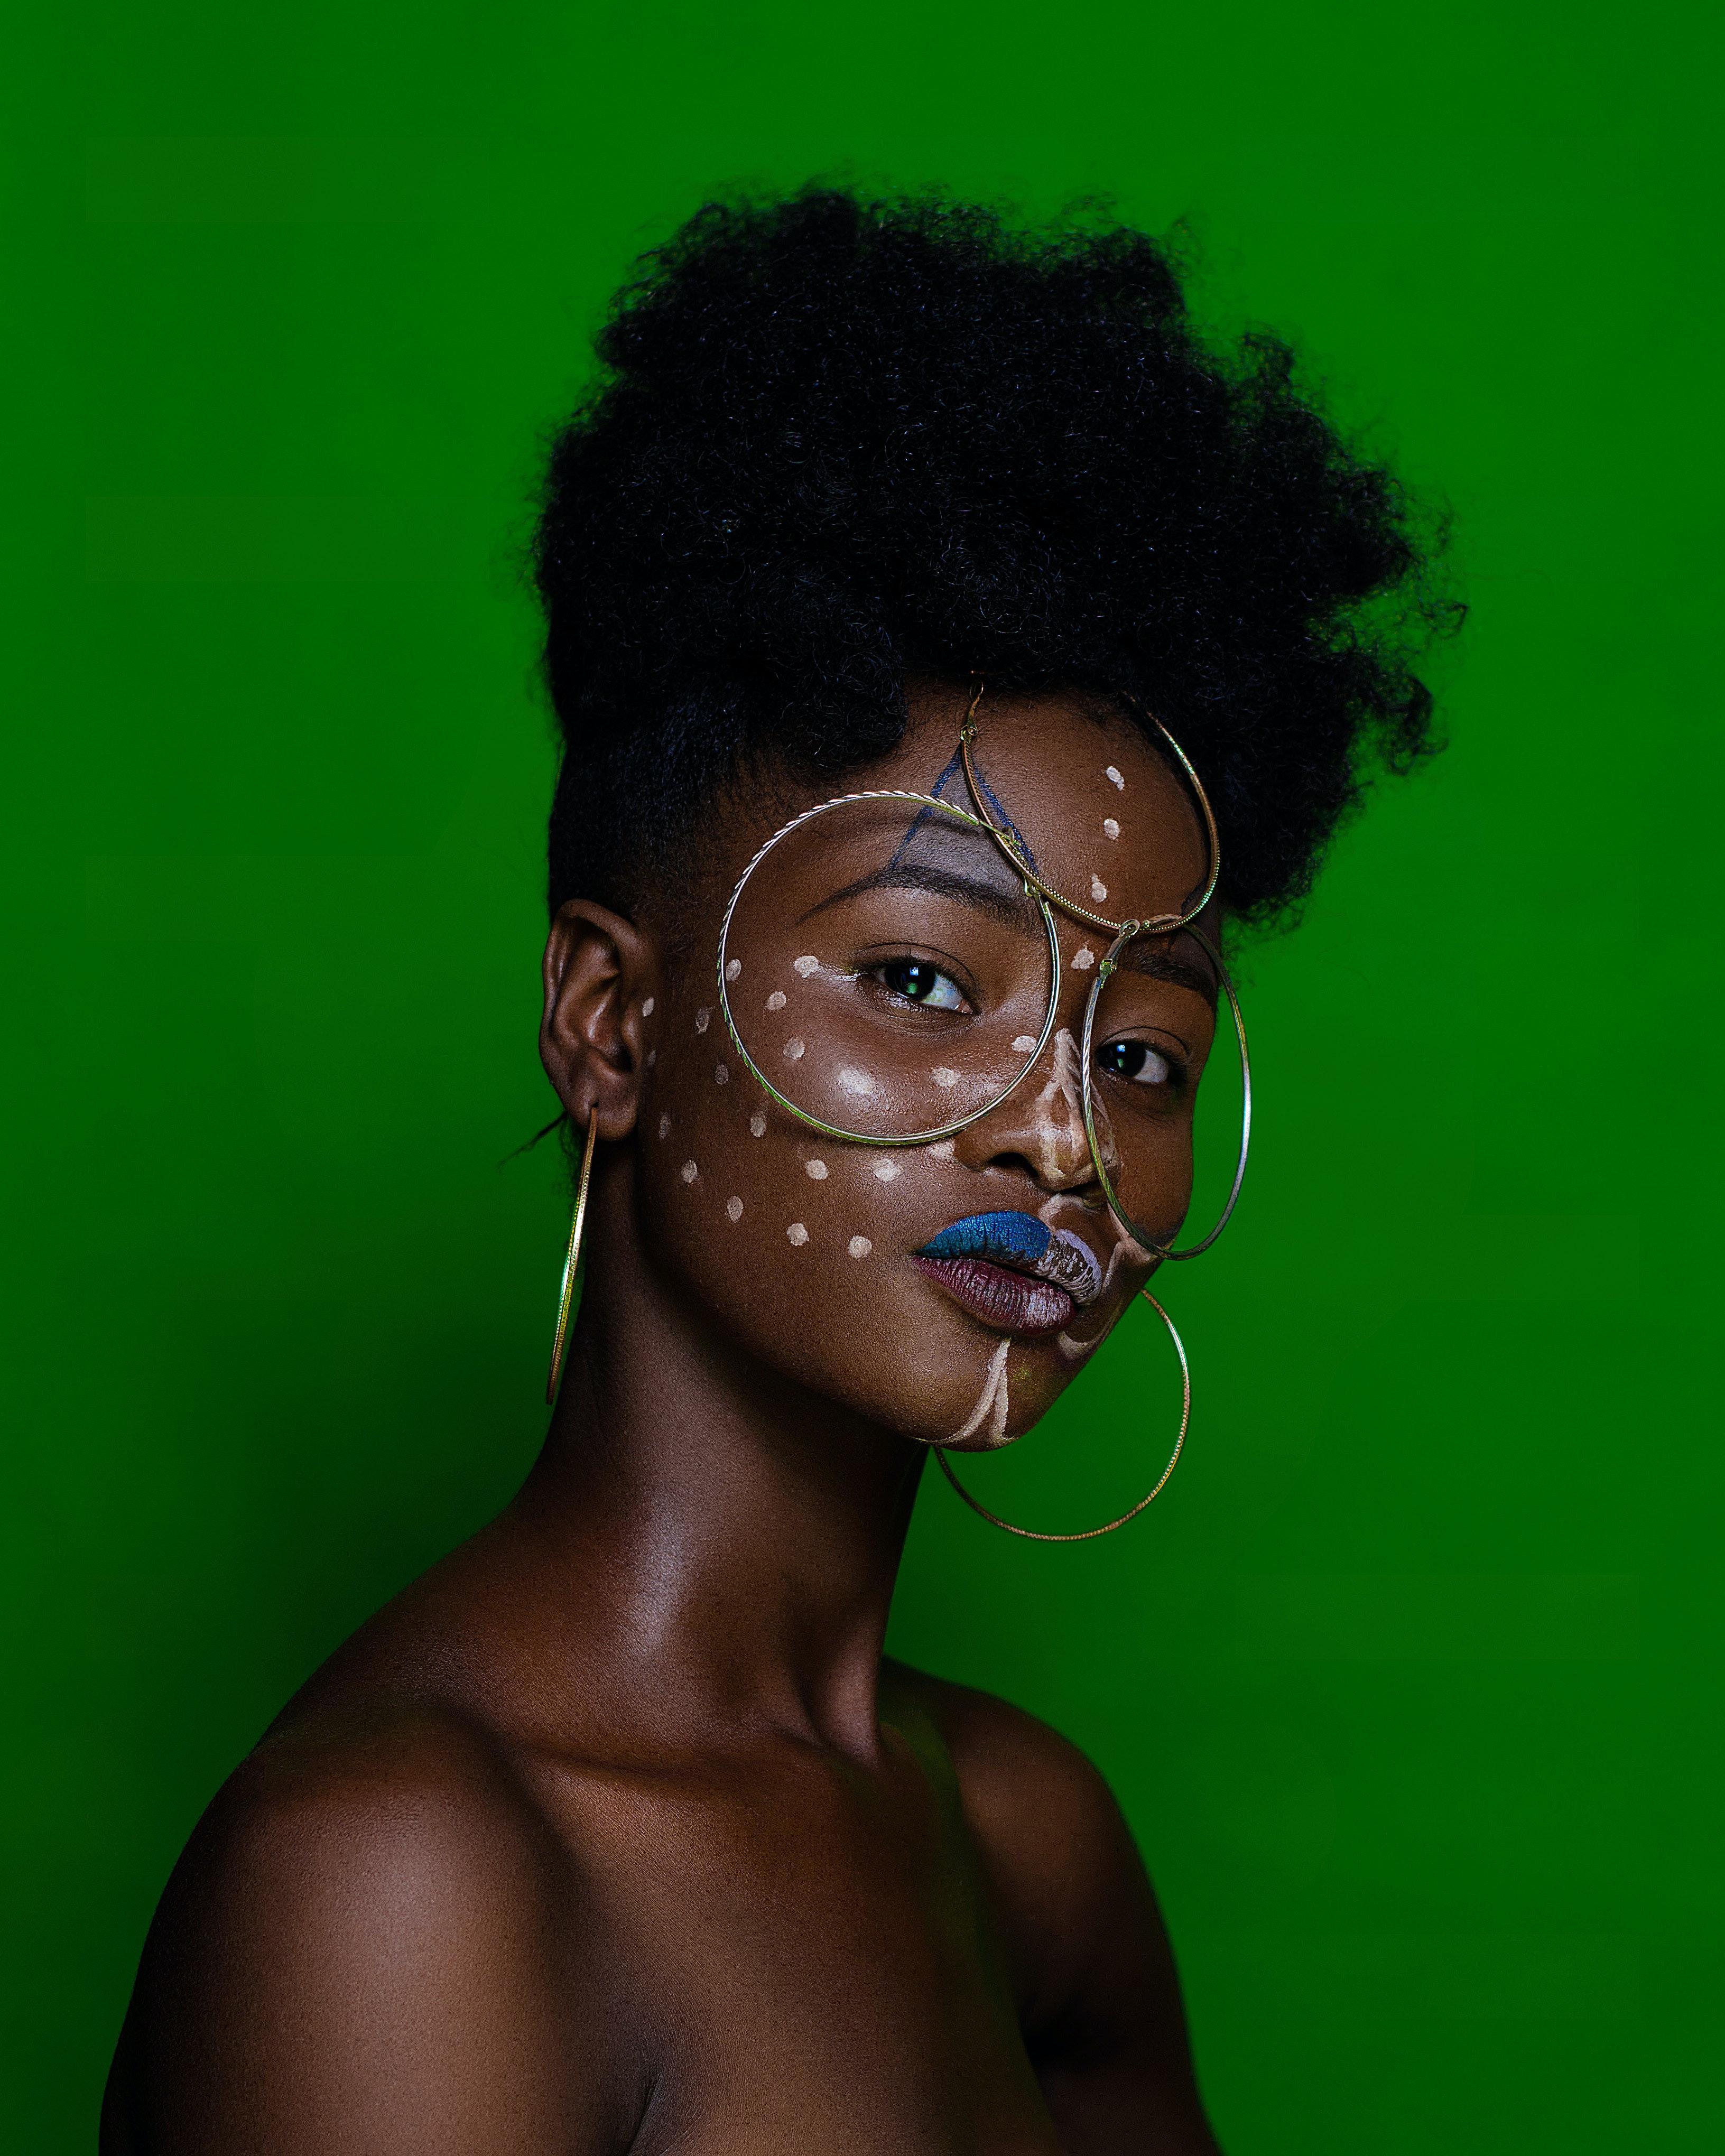 kostenloses foto zum thema: afro, frau, frisur